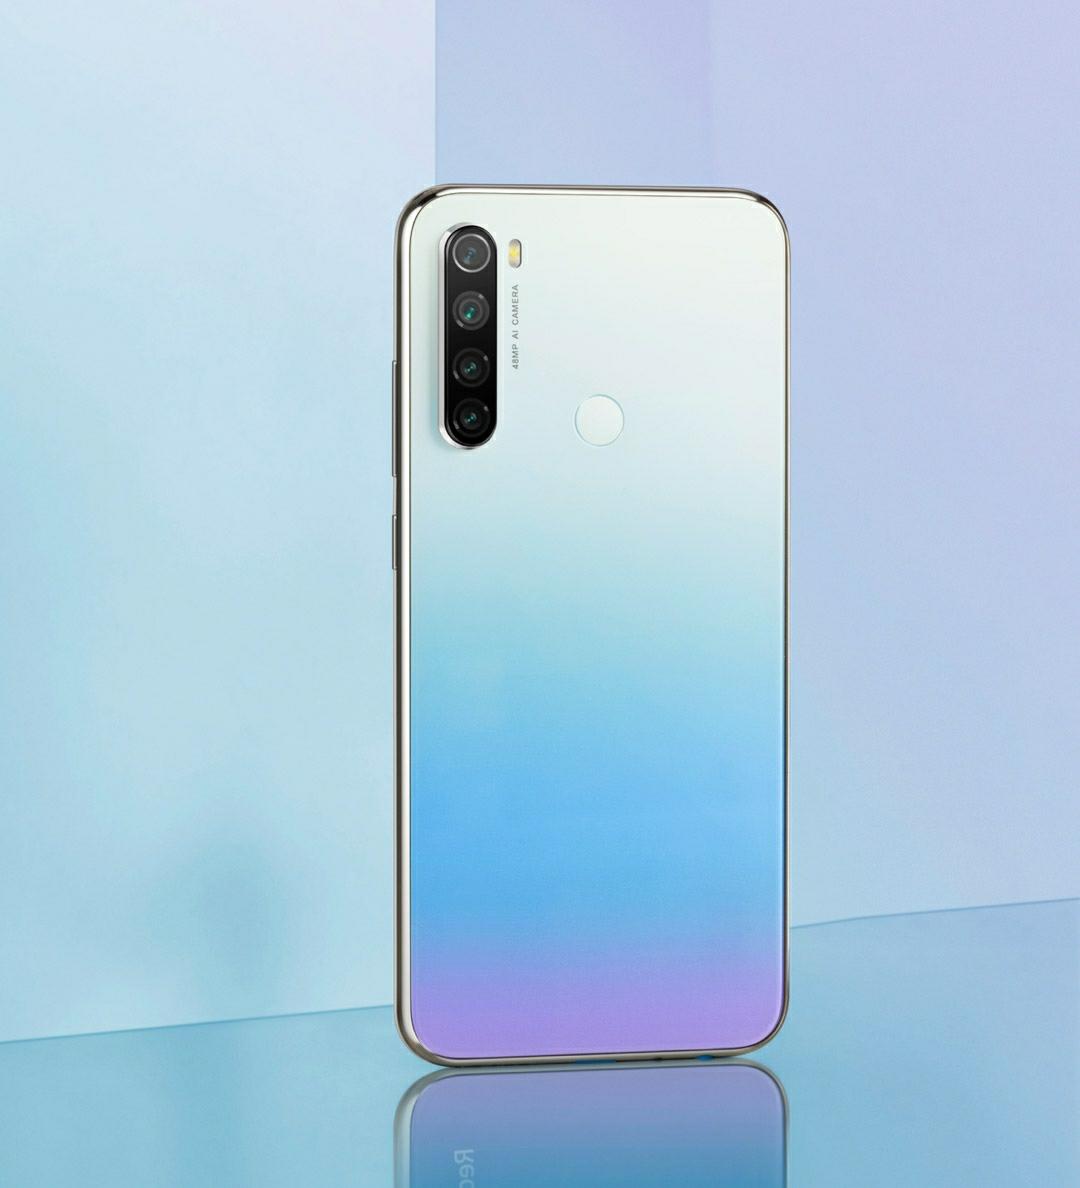 Gradient phone